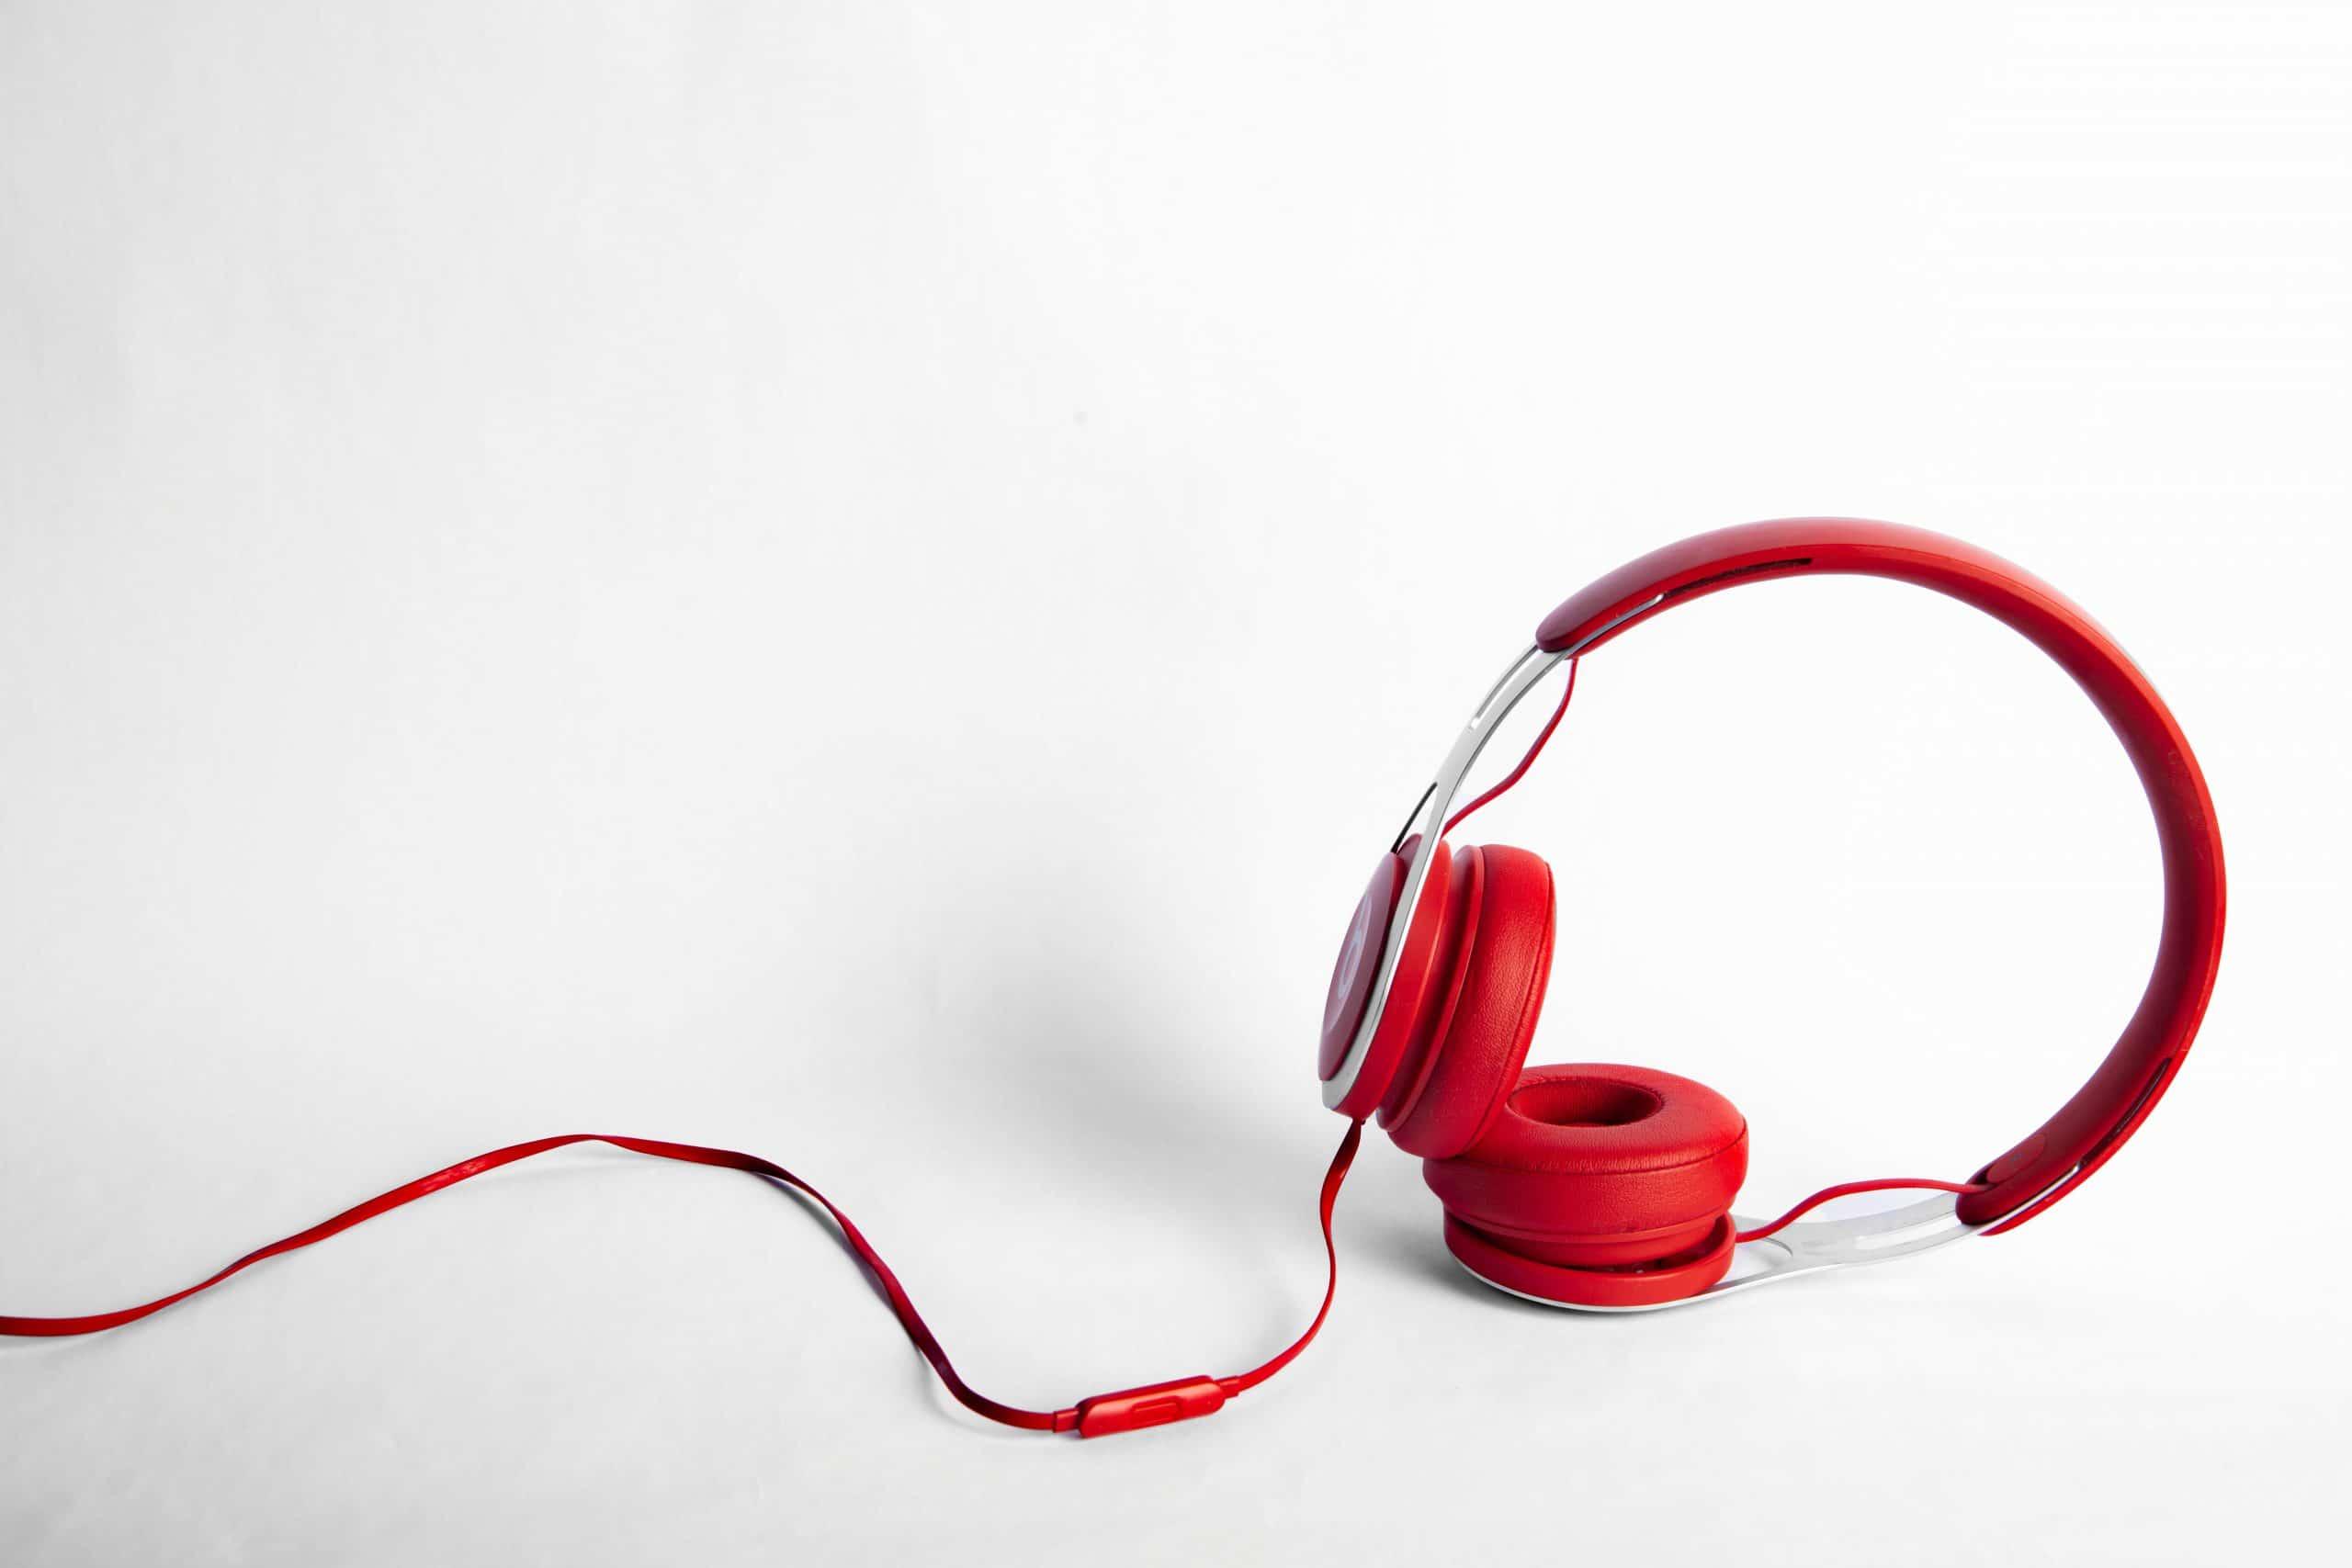 What headphones should i get